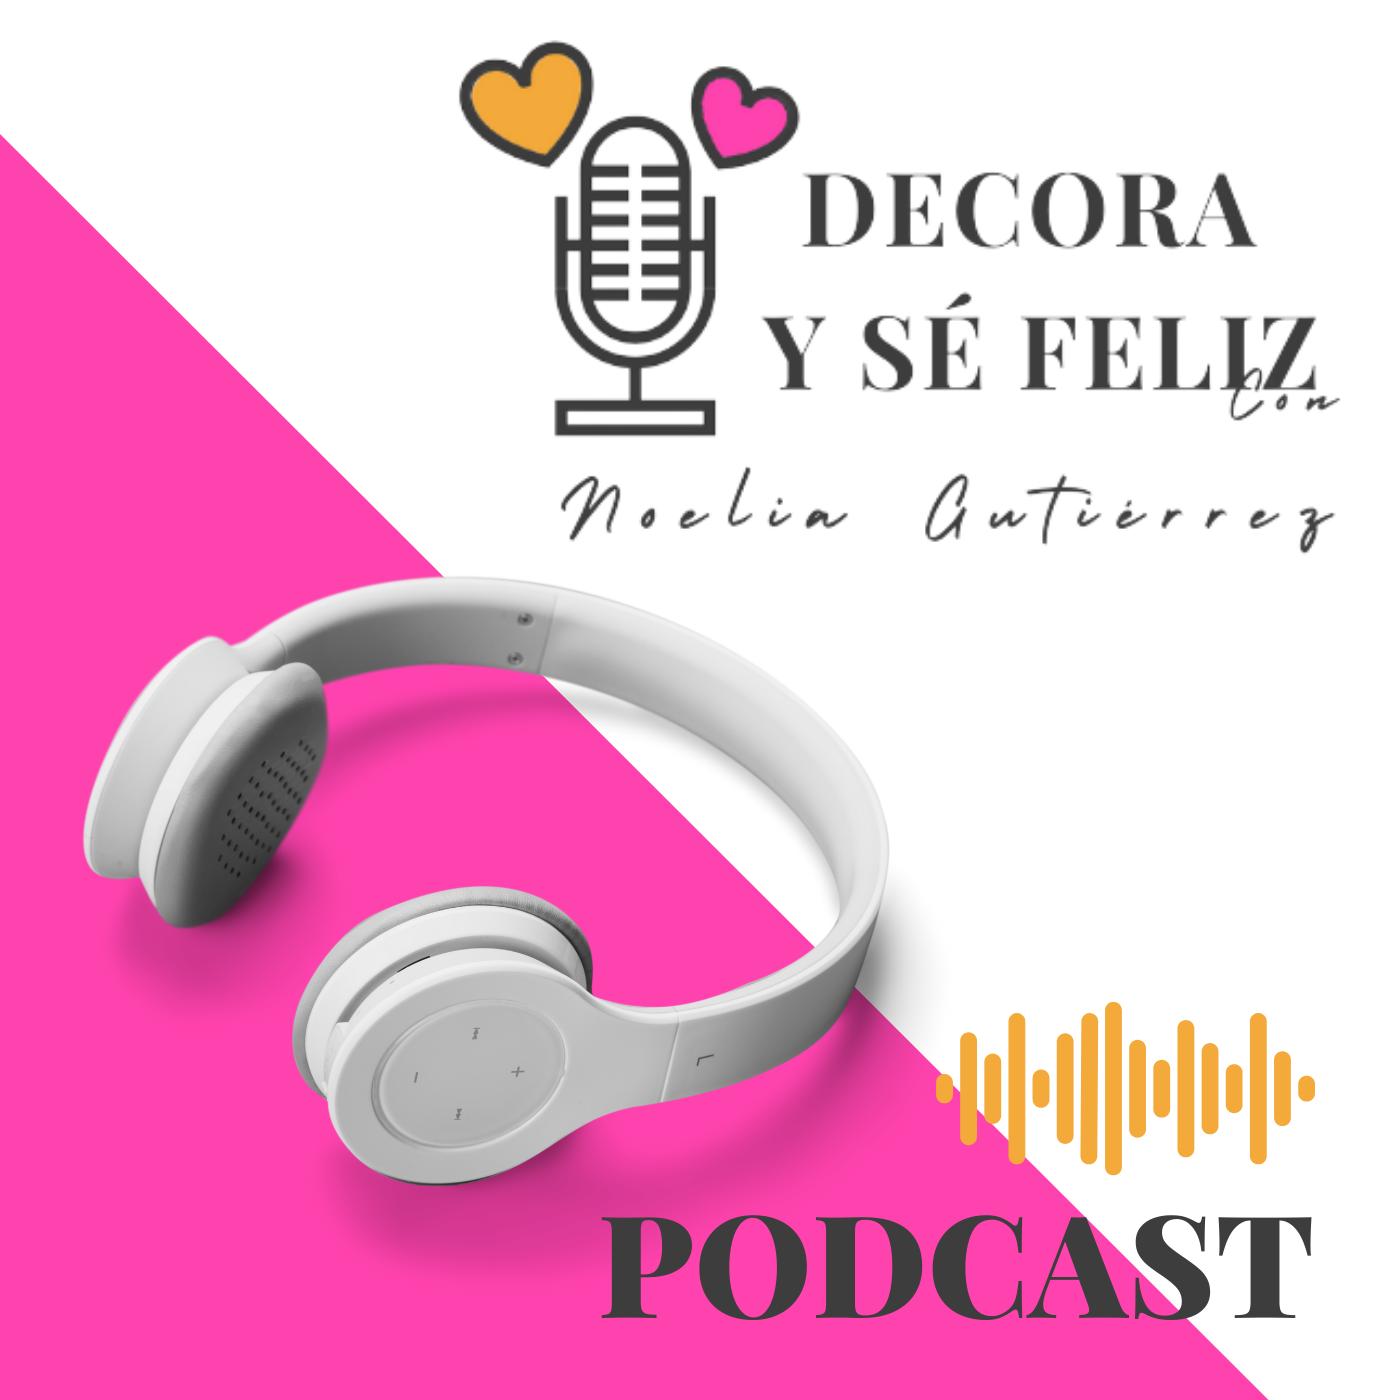 podcast-decora-se-feliz-noelia-unik-designs-decoracion